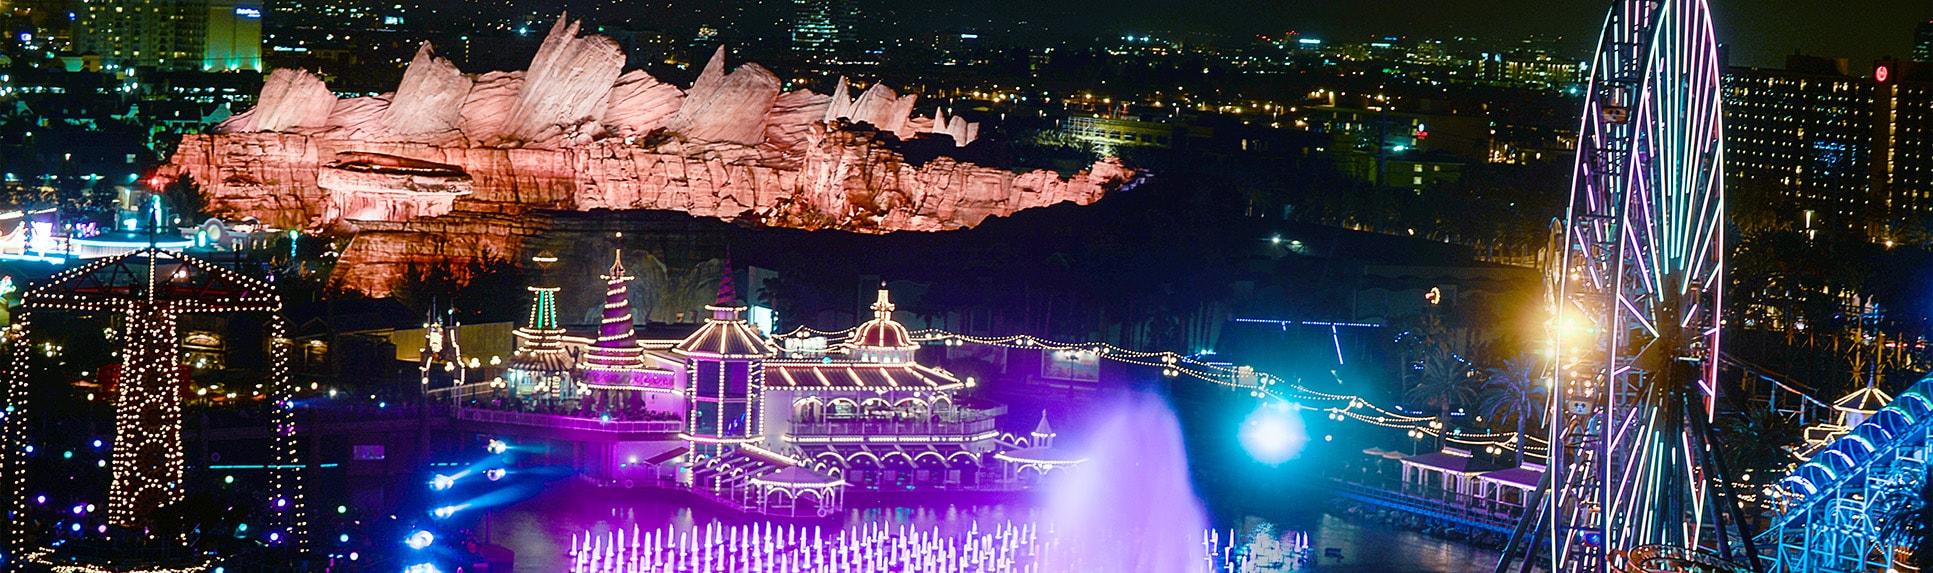 Disney California Adventure Park illuminated at night